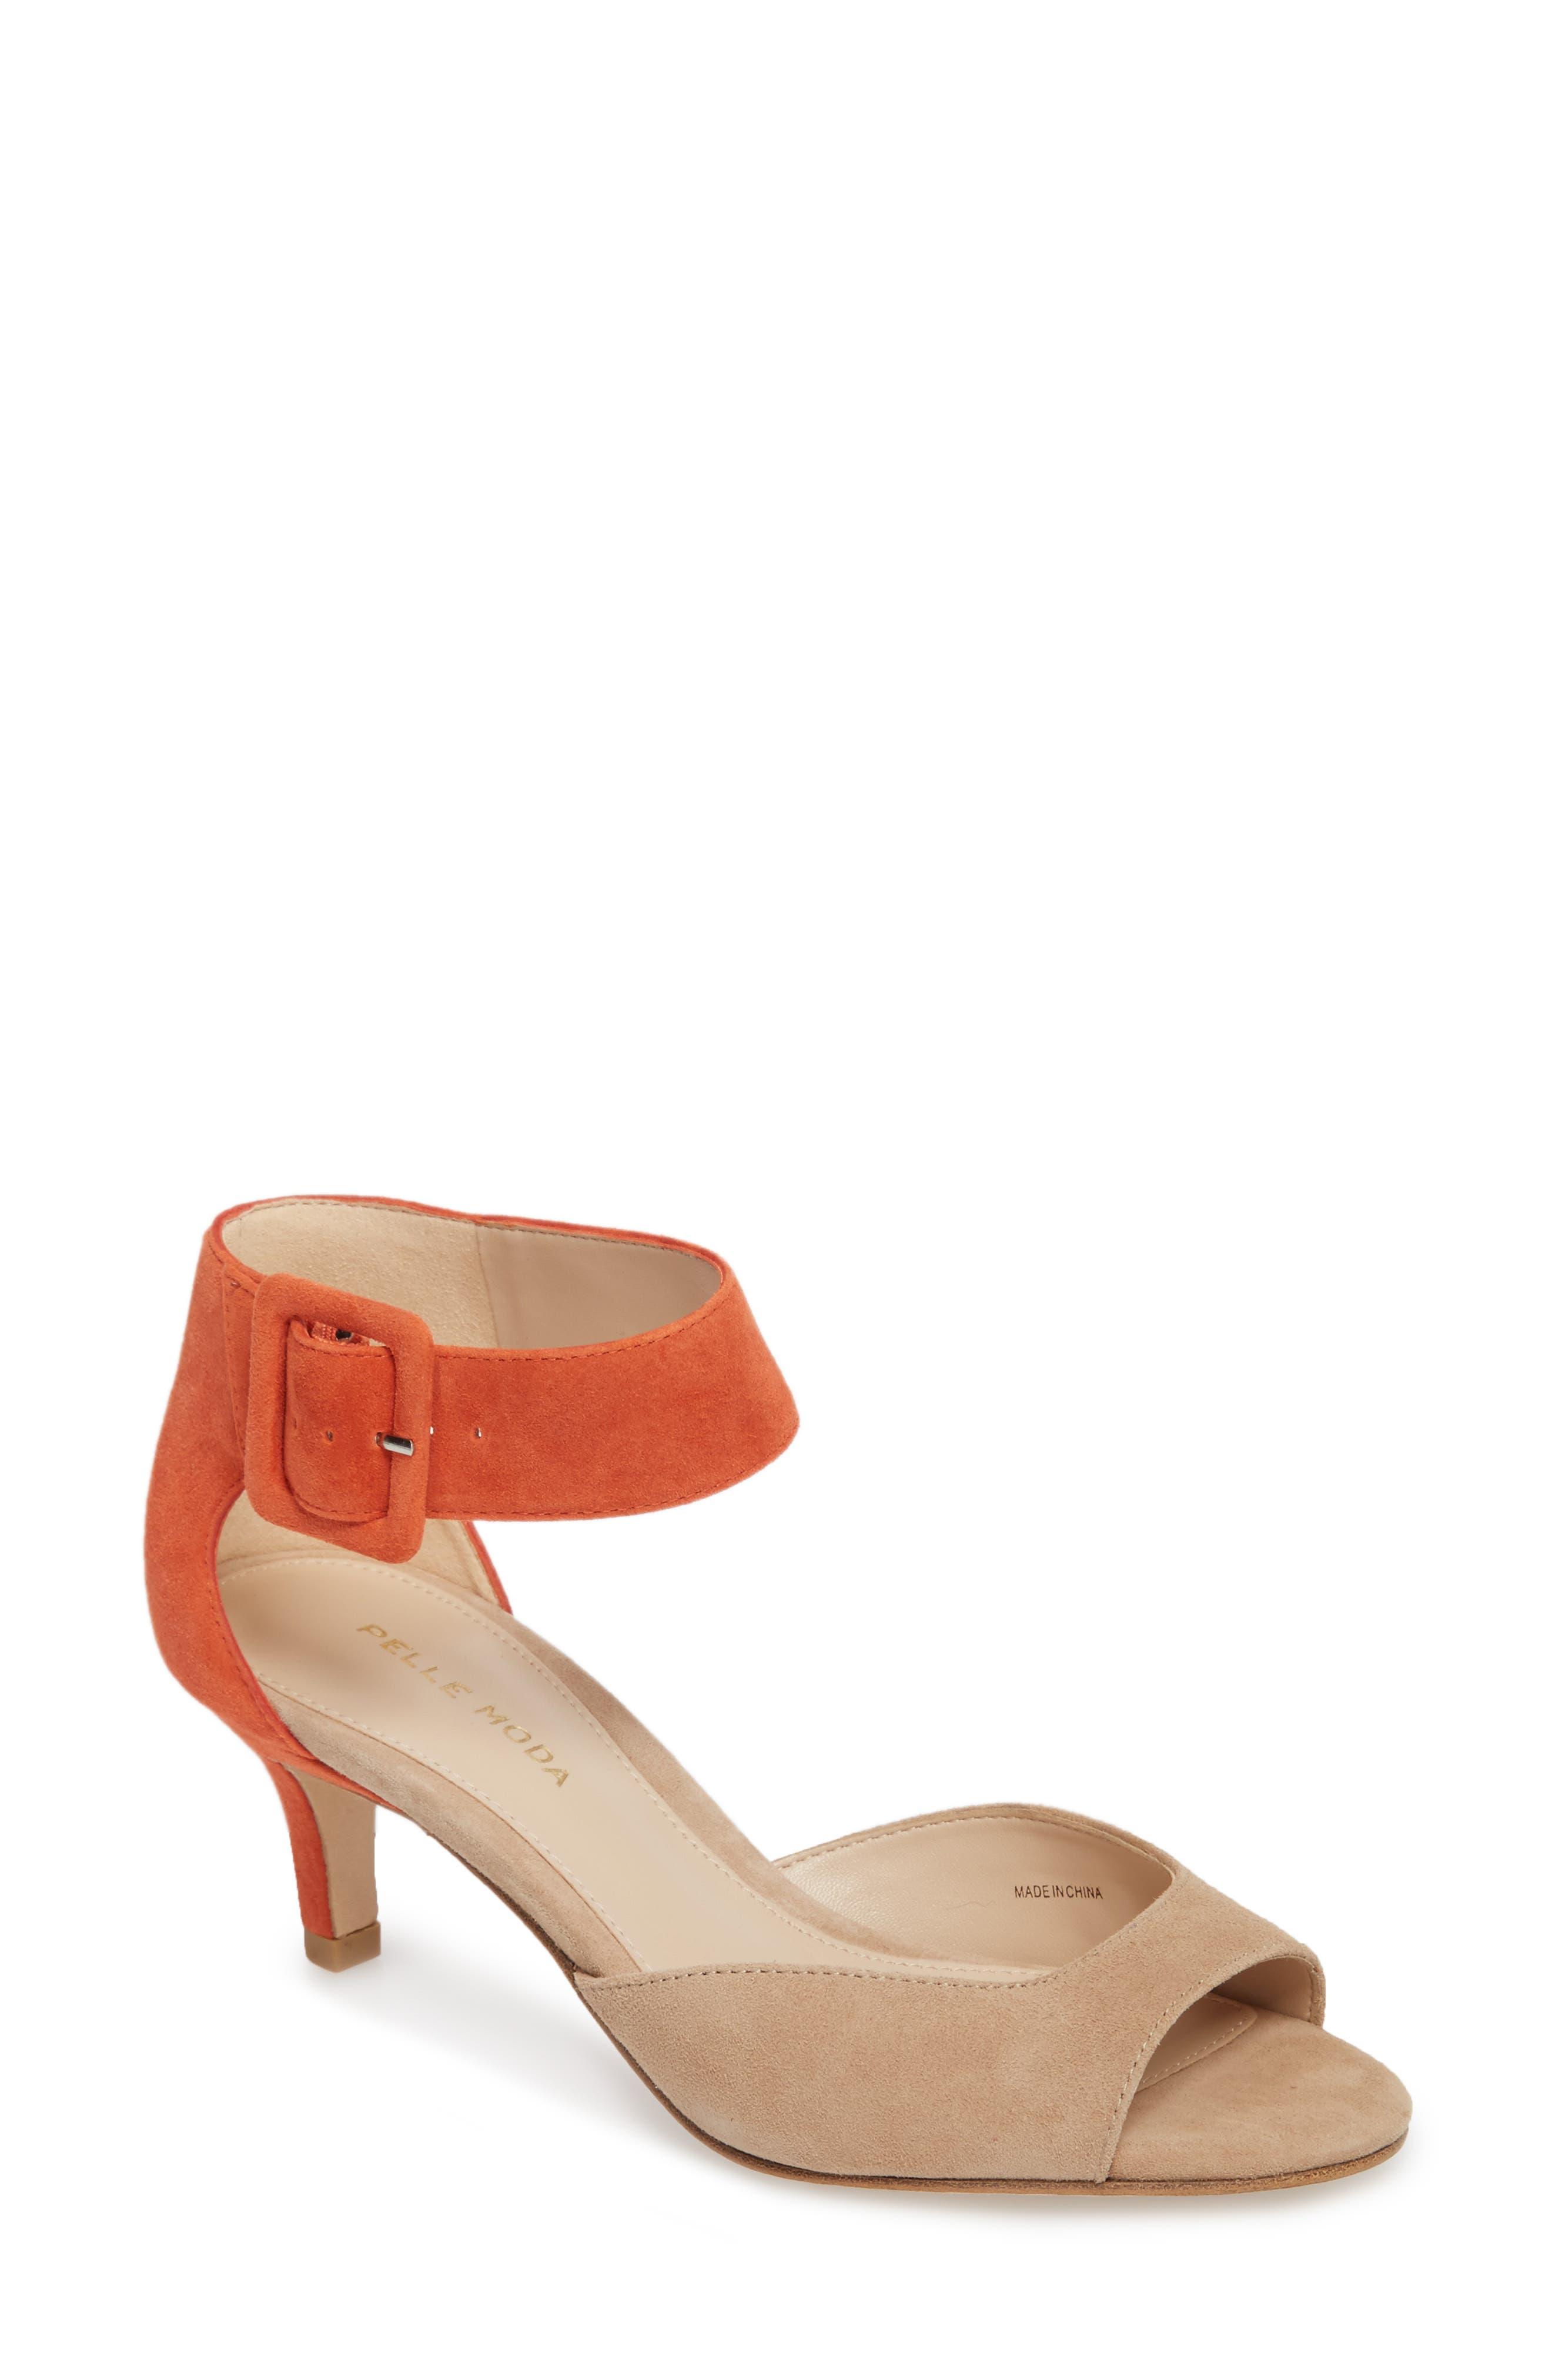 'Berlin' Ankle Strap Sandal,                             Main thumbnail 3, color,